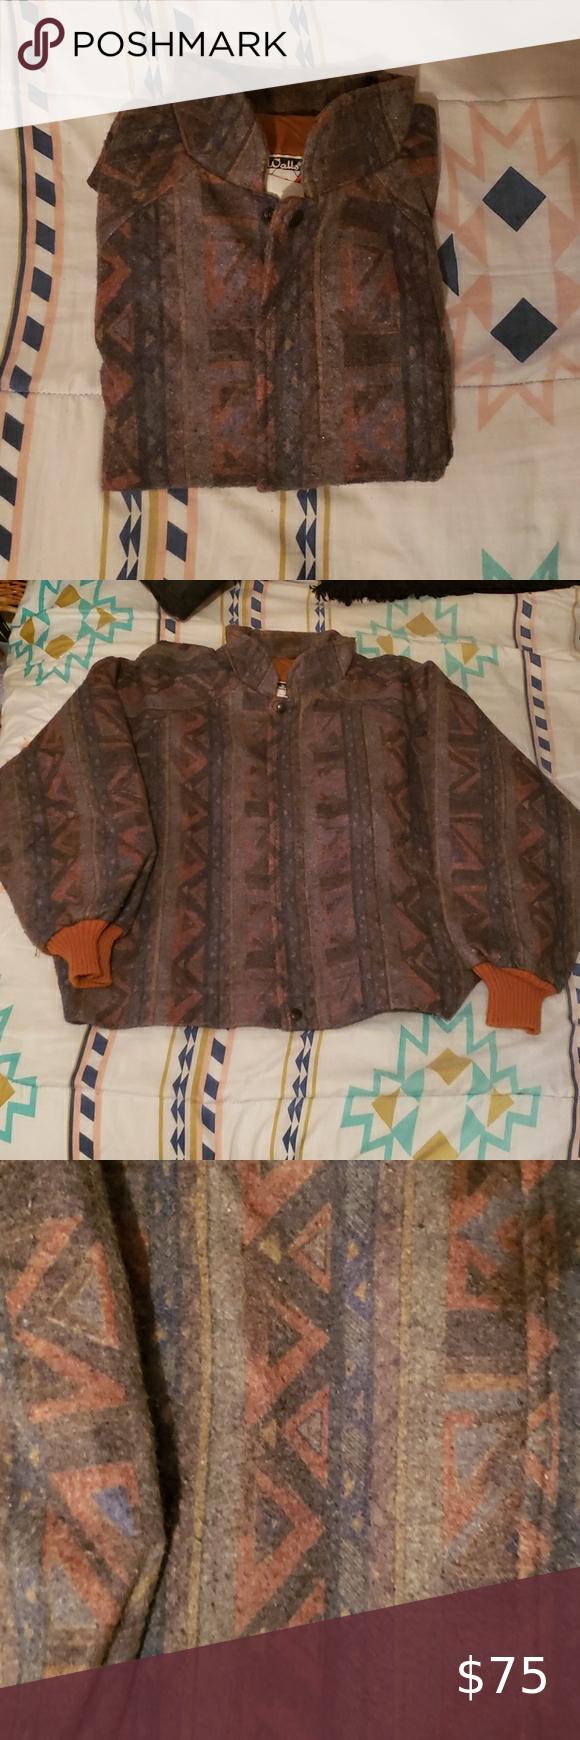 Vintage Mountain Native Navajo Bomber Jacket Usa Bomber Jacket Warm In The Winter Mountain Jacket [ 1740 x 580 Pixel ]